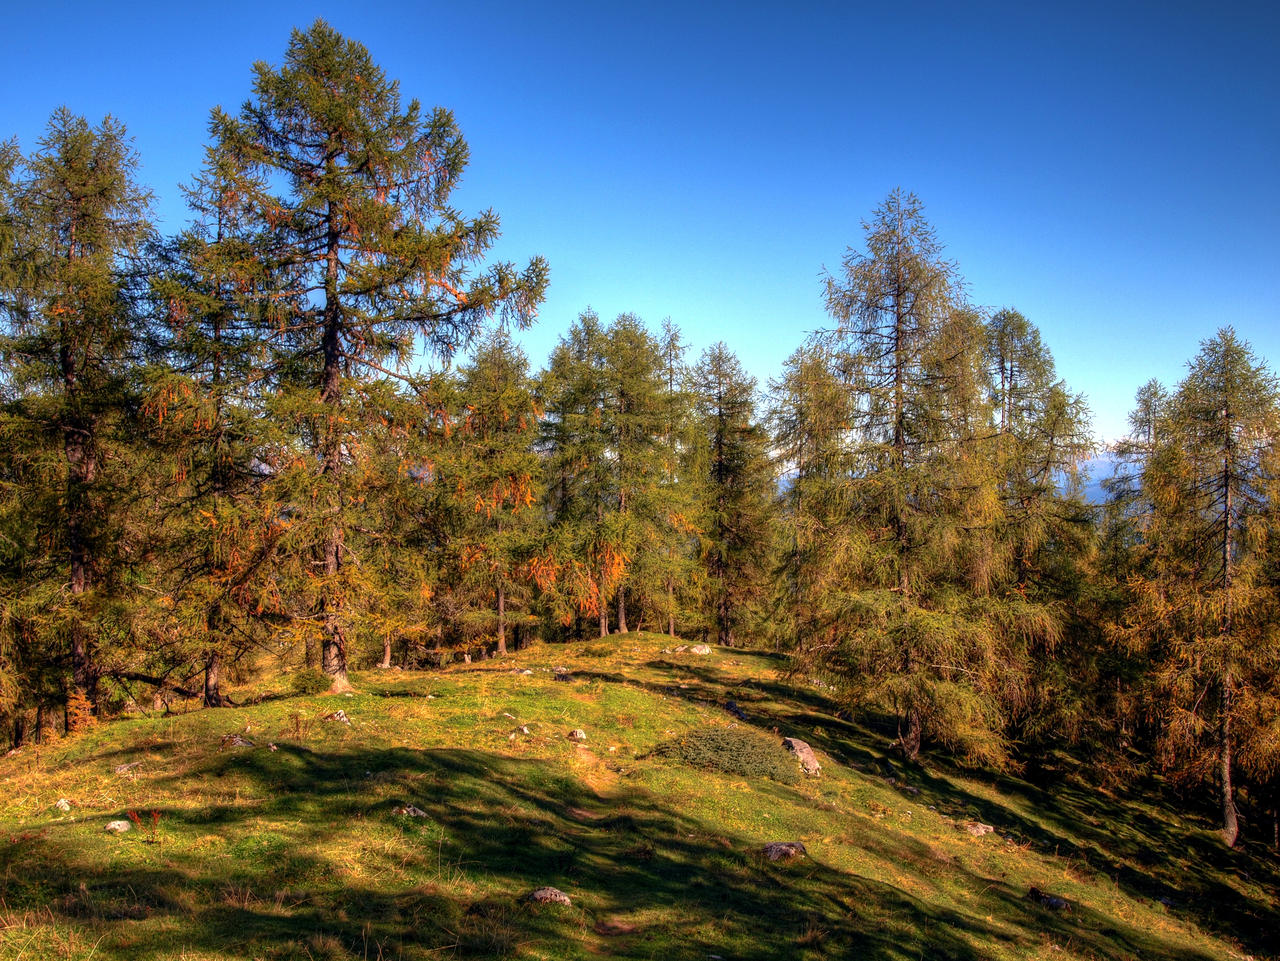 Larchground by Burtn